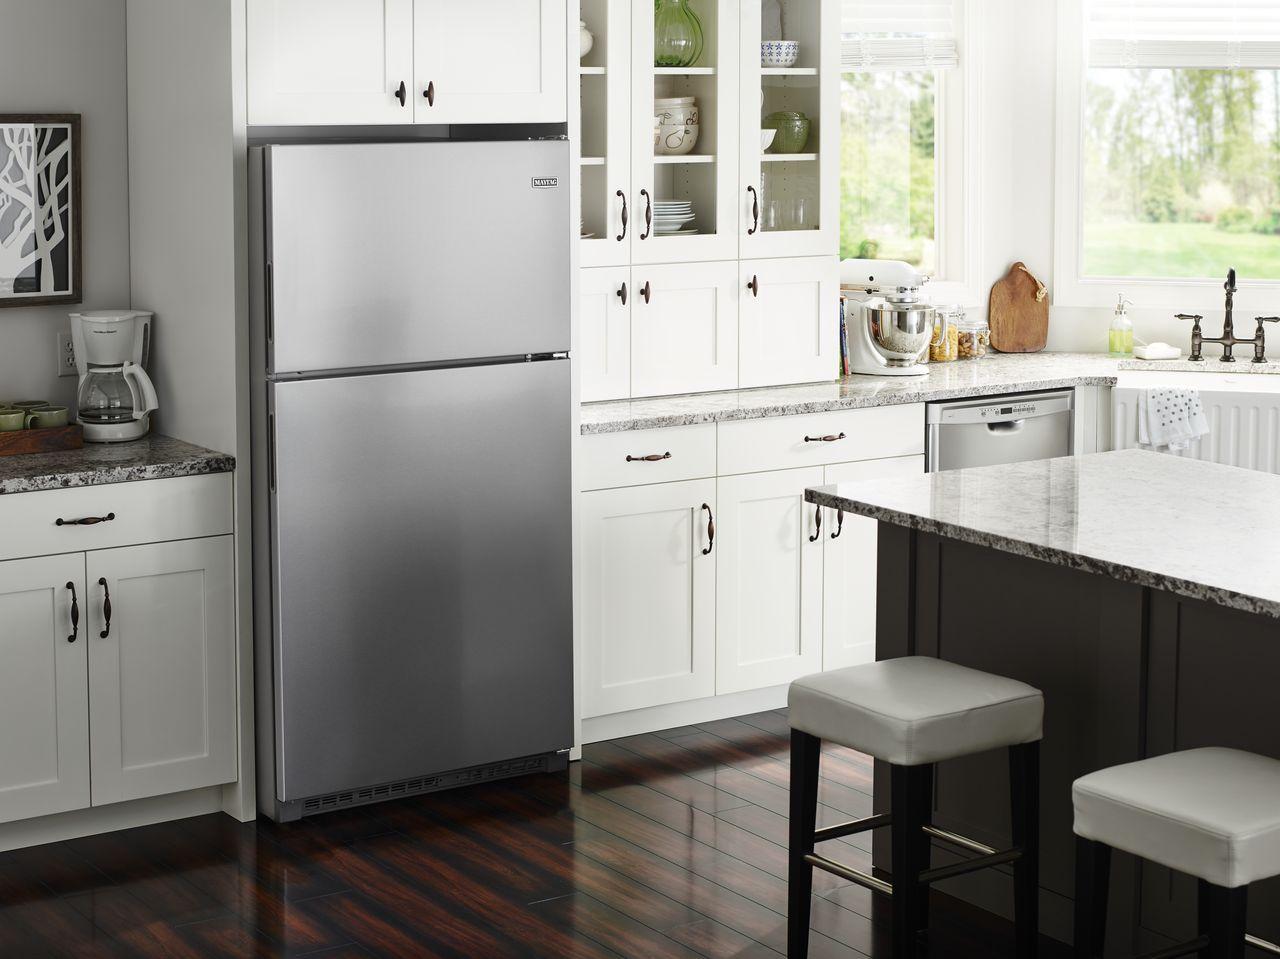 Maytag Top Freezer Refrigerator